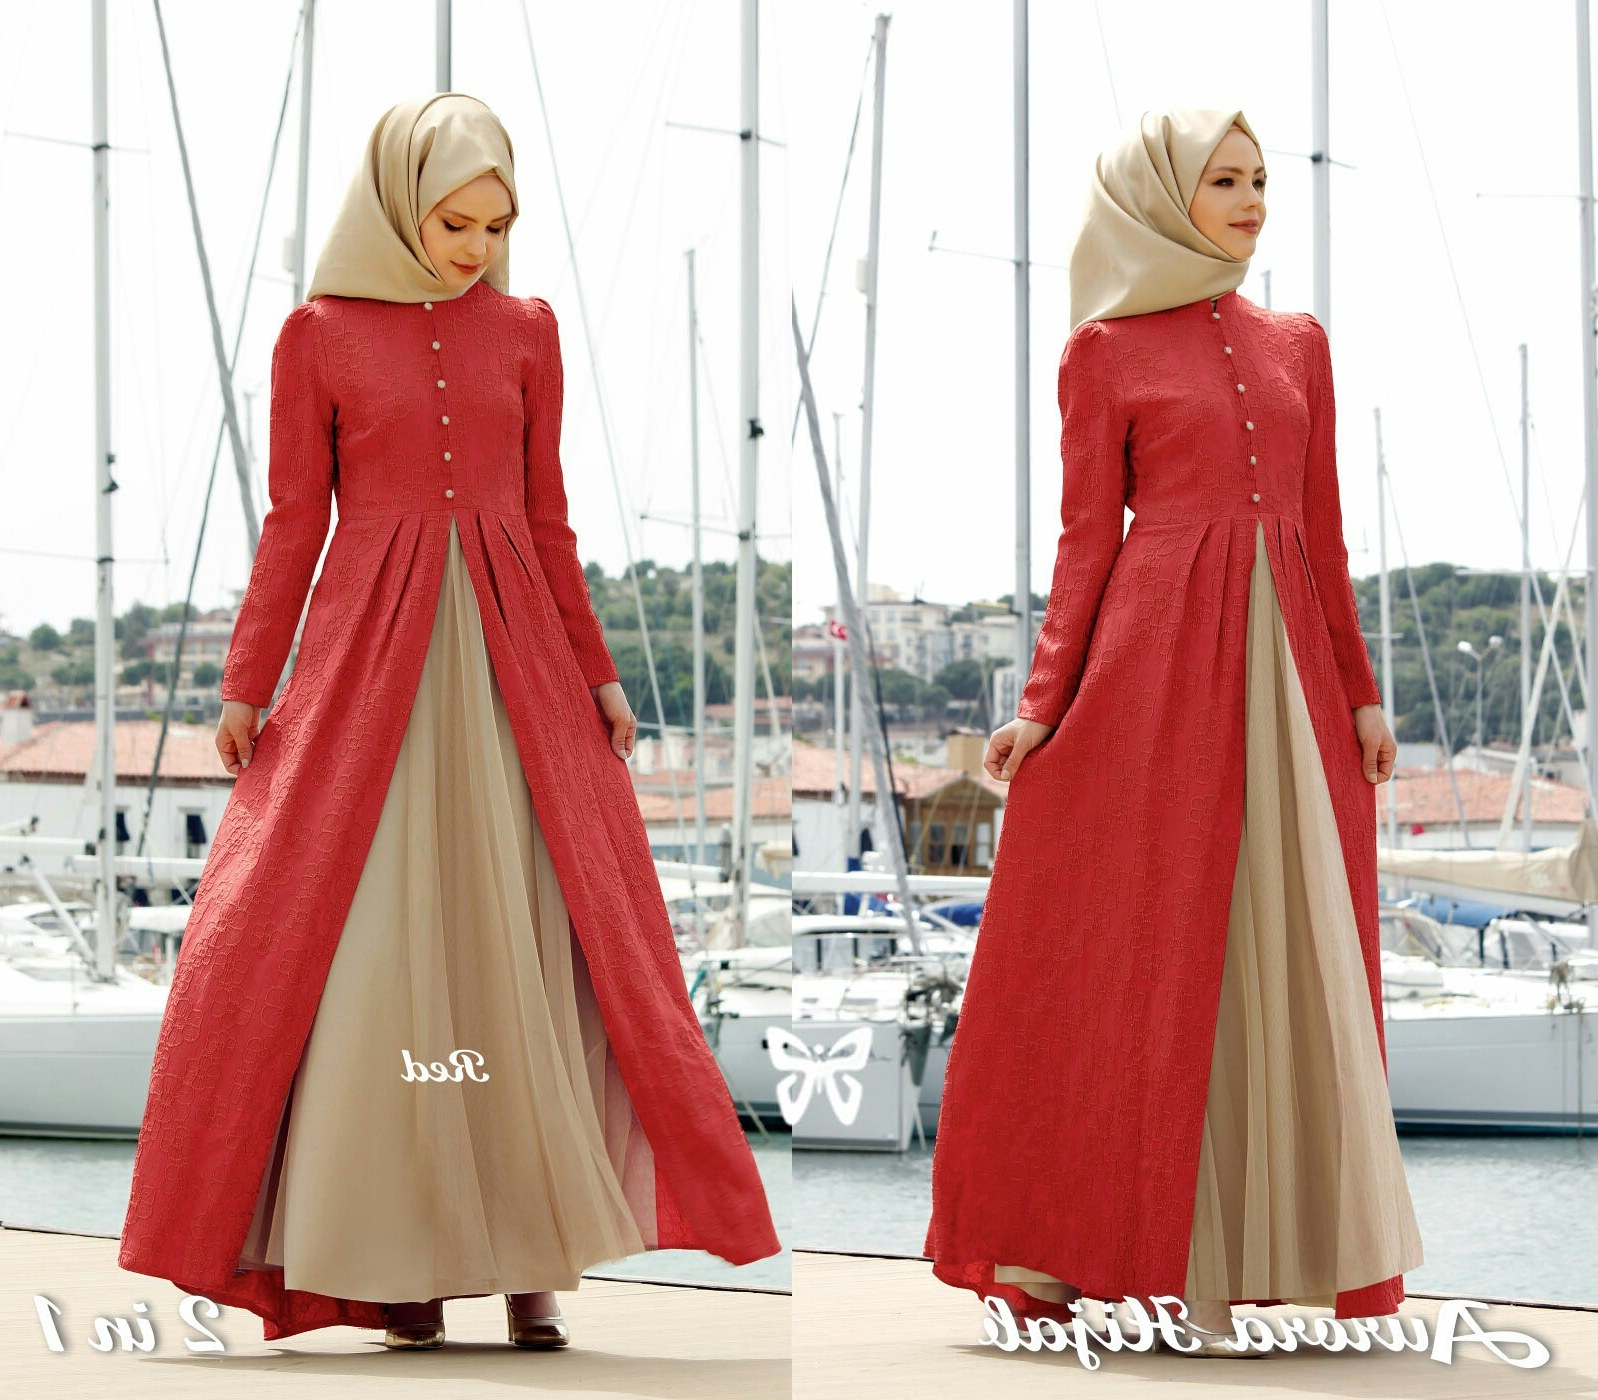 Ide Fashion Muslim Terbaru O2d5 Model Gamis Baju Muslim Fashion Hijab Terbaru Setelan